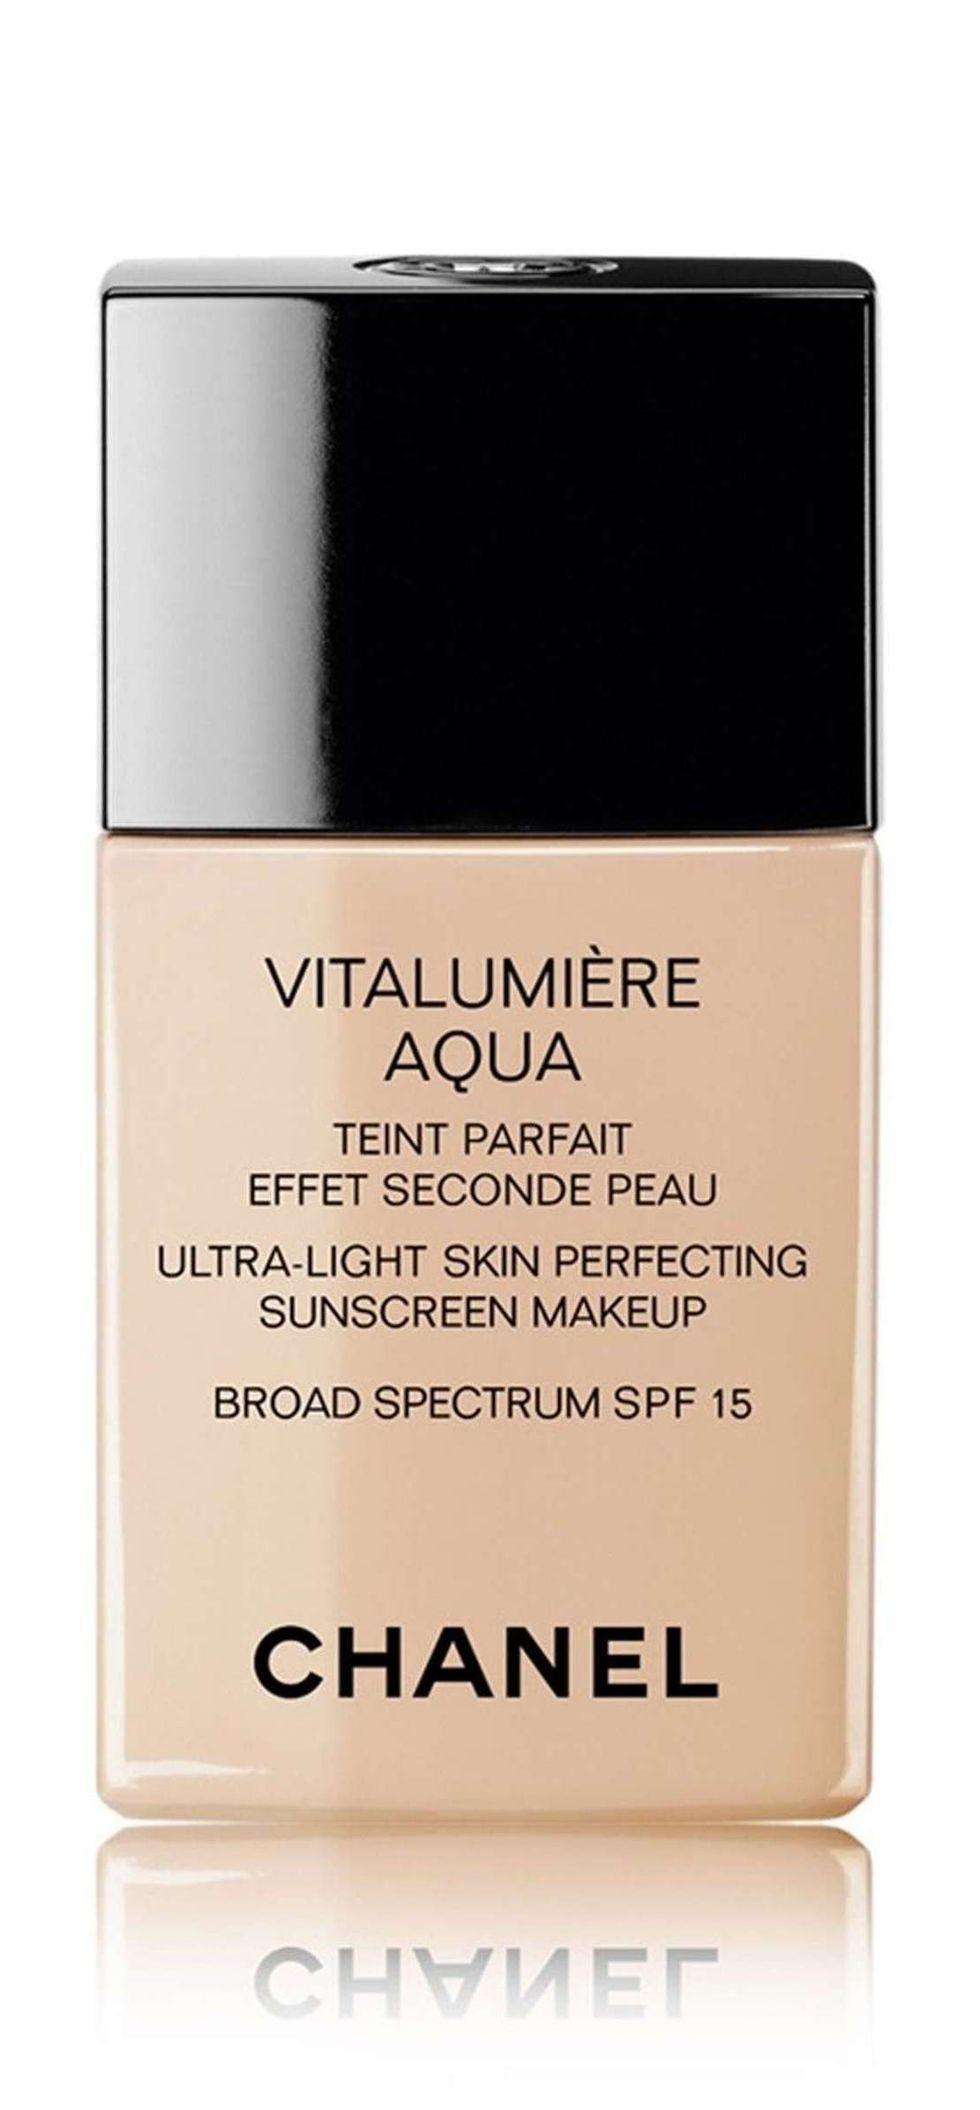 e39af7e52c4 Best Foundation for Oily Skin - 21 Oil Free Foundation Makeup Picks for Acne -Prone Skin  SkinCareRoutine